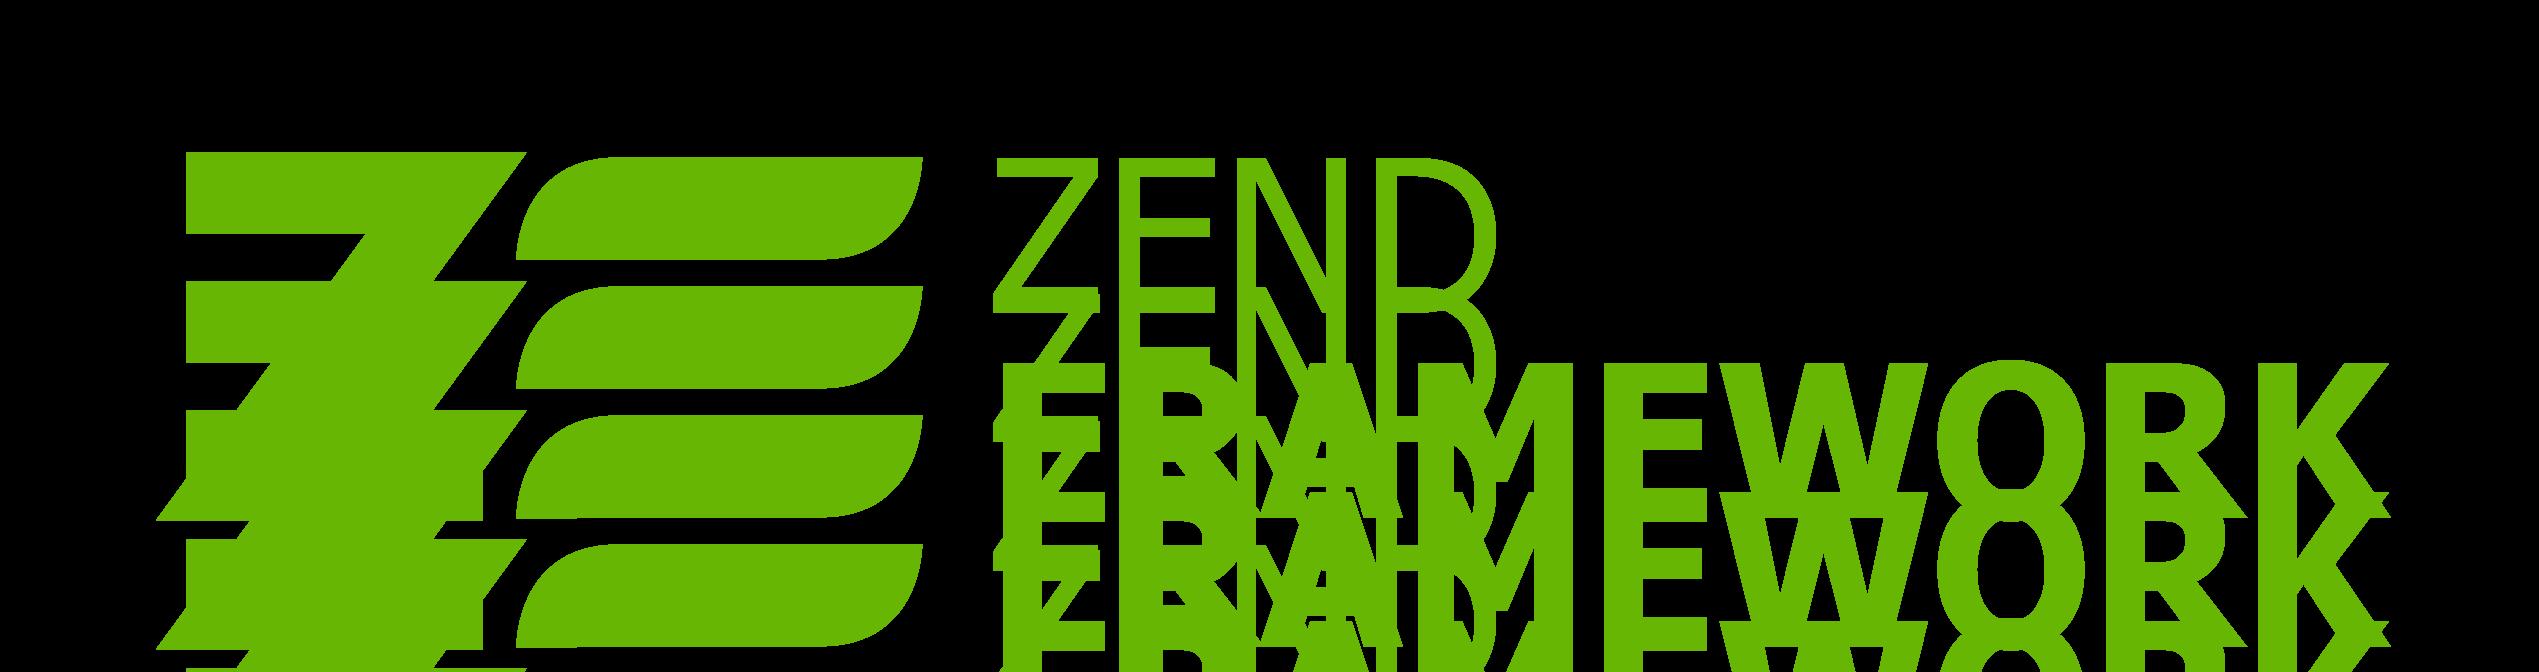 Archivo:ZendFramework-Logo.png - Wikipedia, la enciclopedia libre